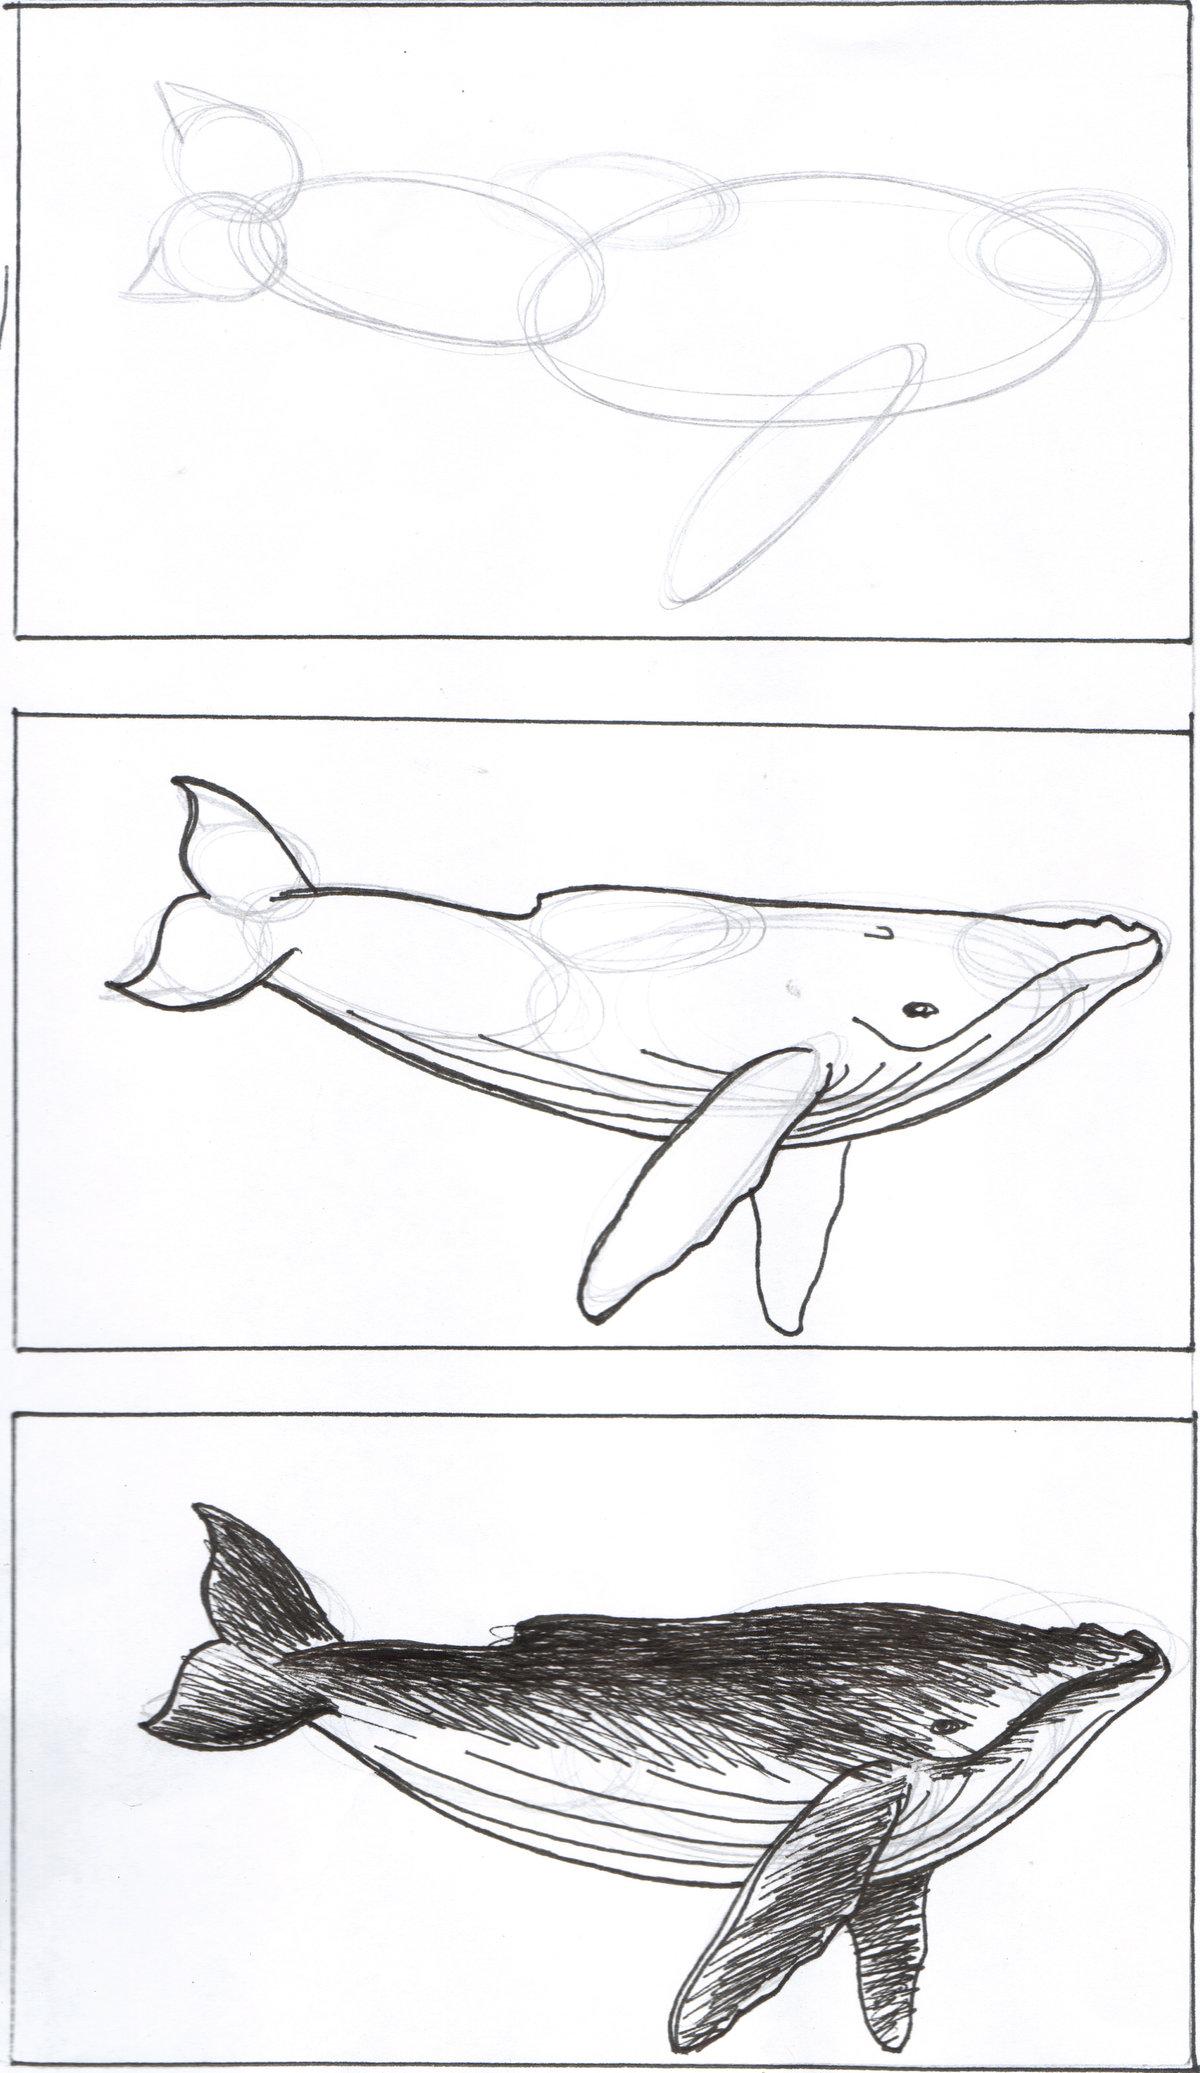 синий кит рисунок карандашом поэтапно один